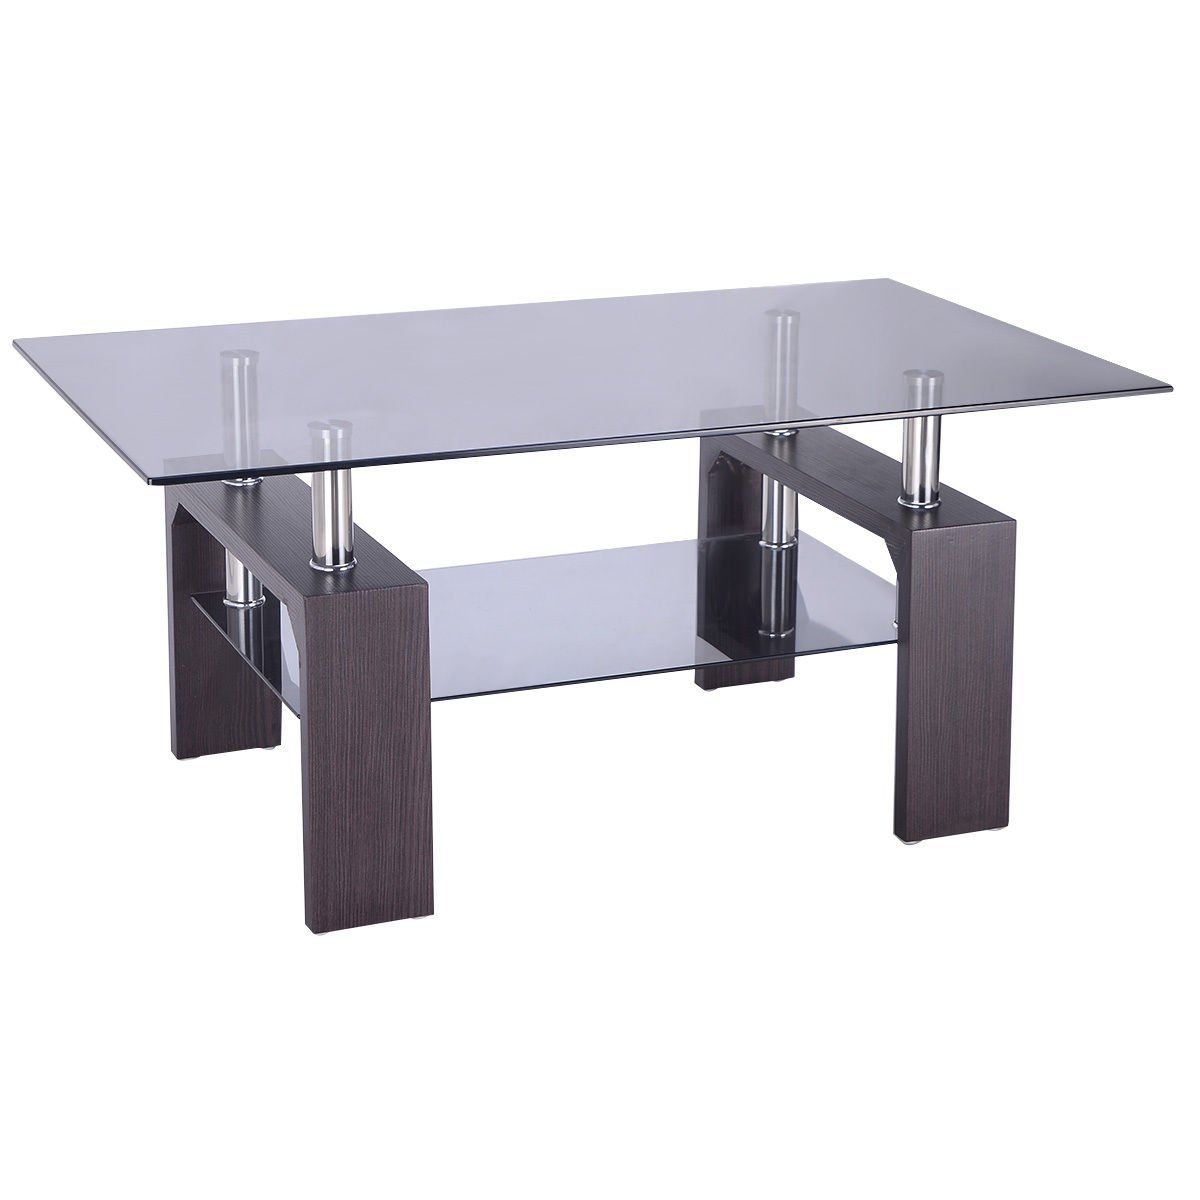 Tangkula Rectangular Glass Coffee Table Shelf Wood Living Room Home Furniture (Dark Wooden)